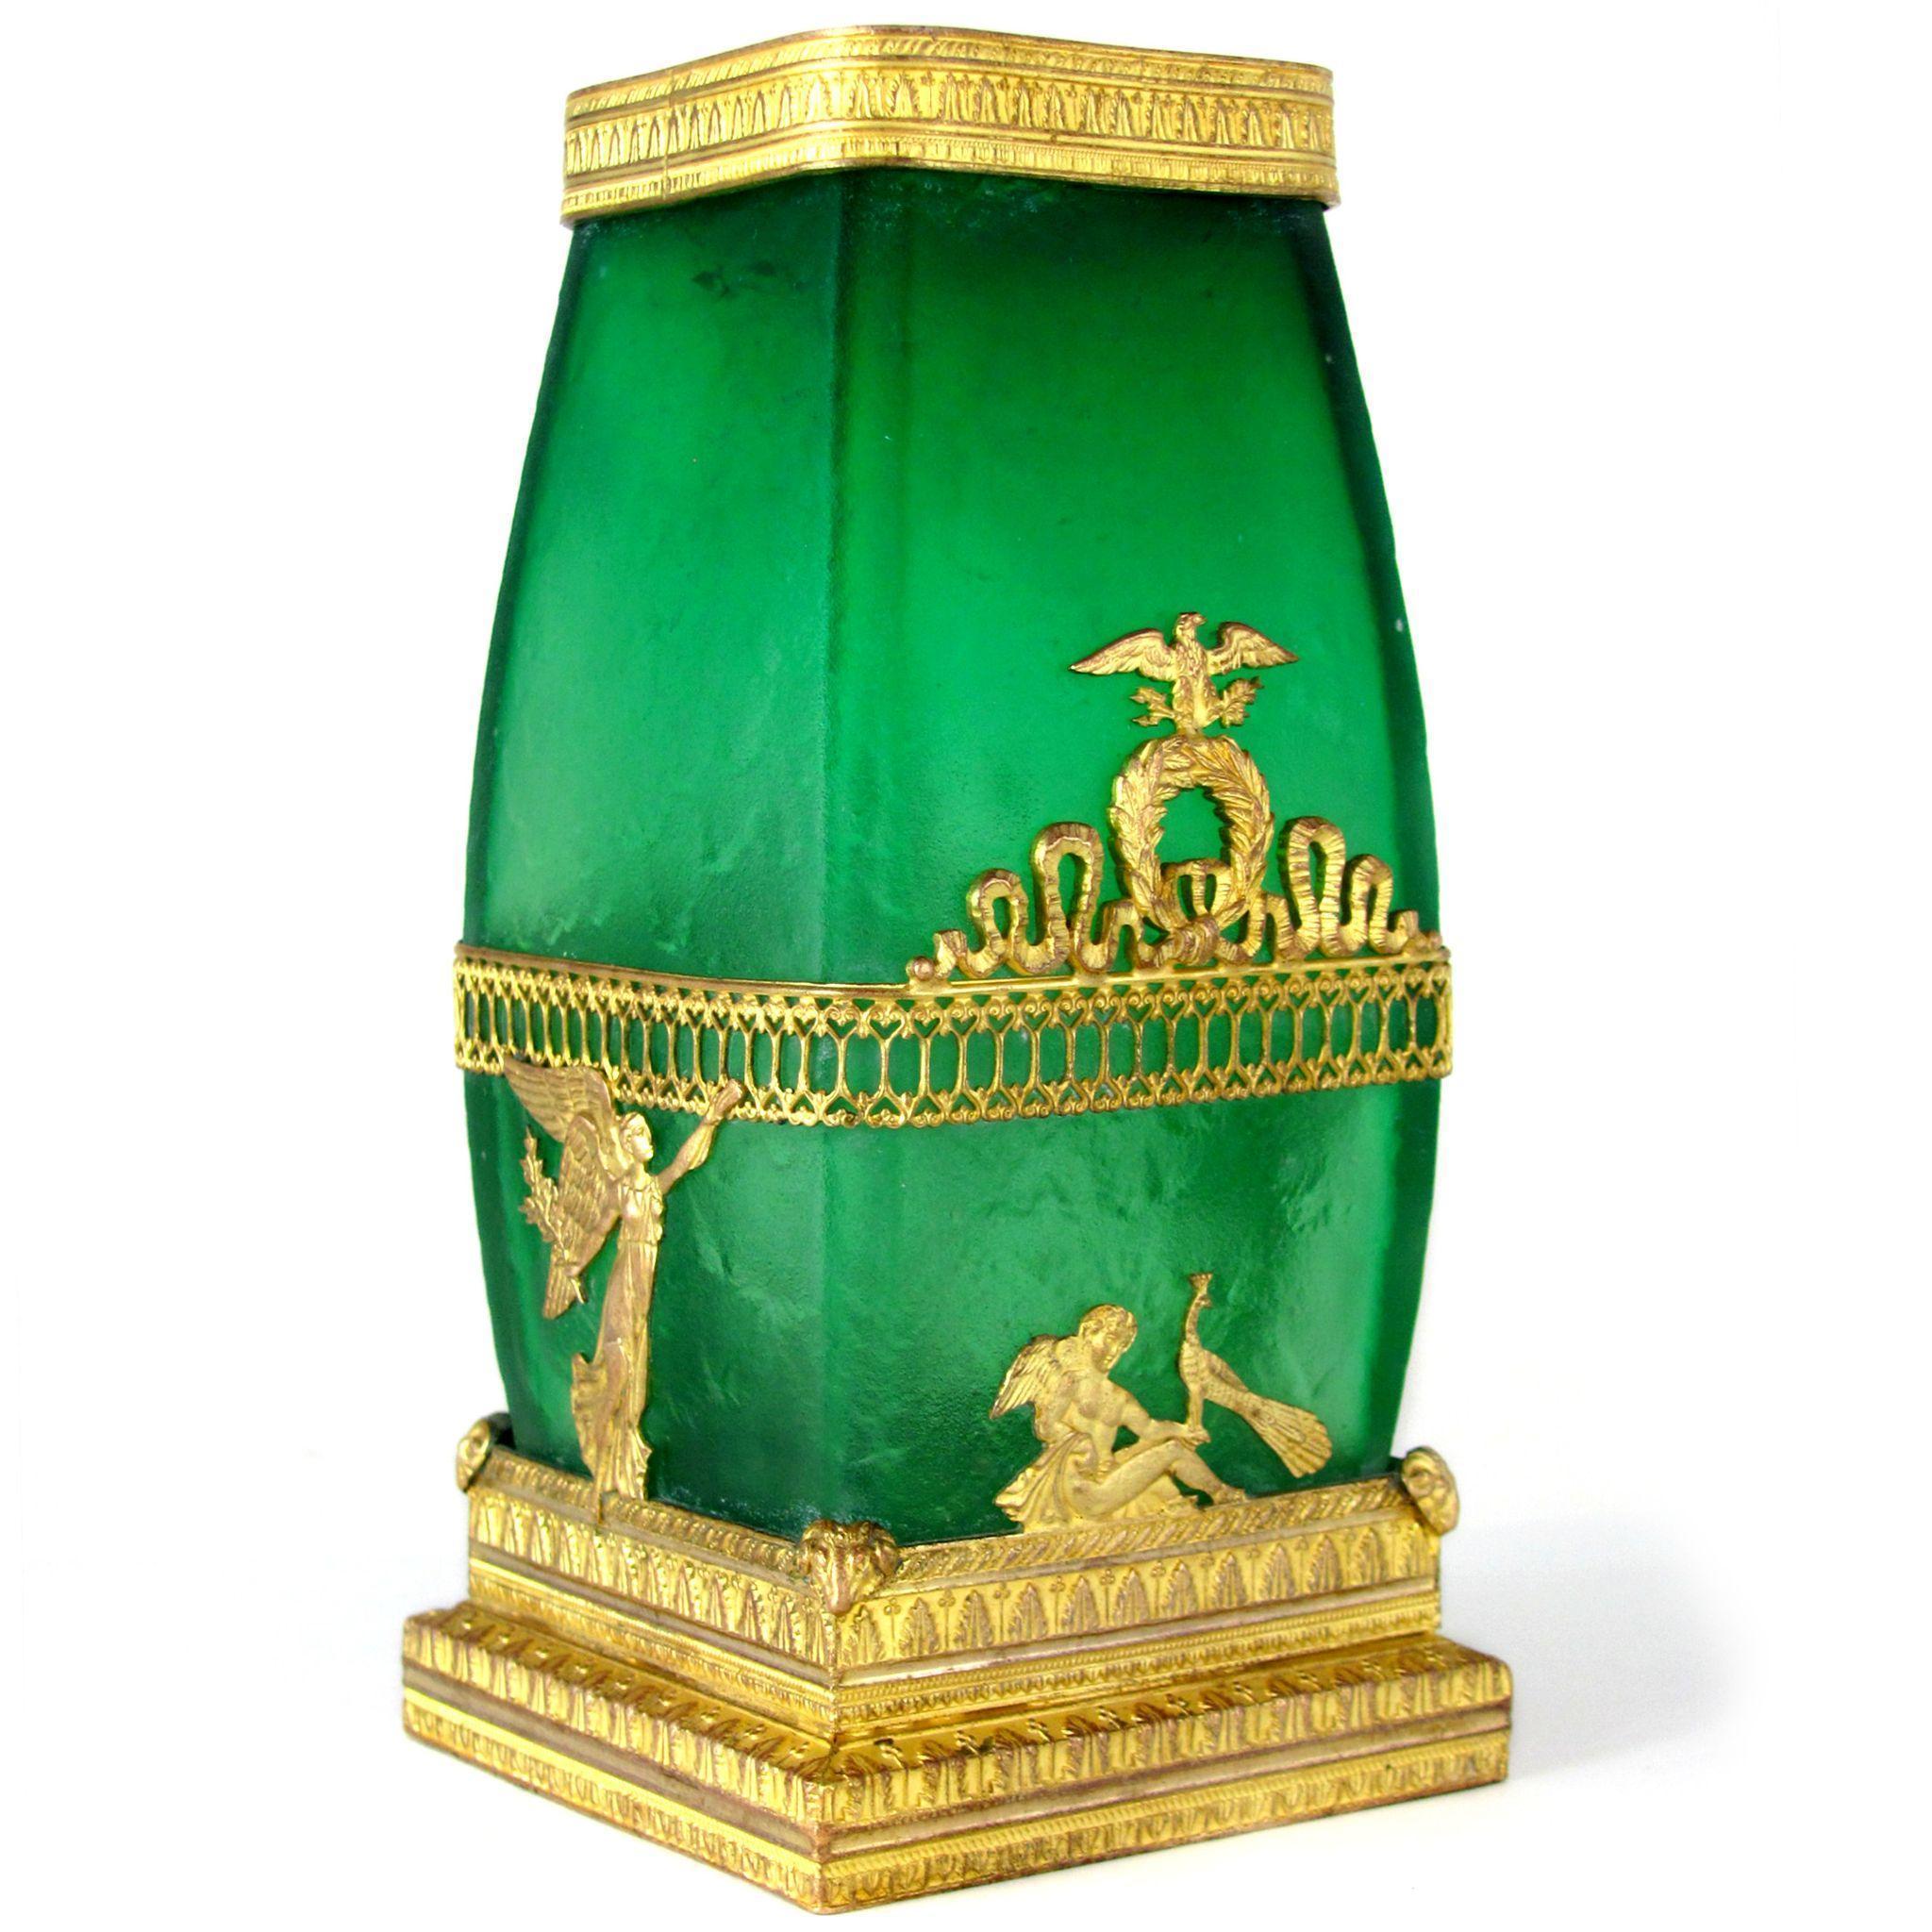 Antique French Napoleon III Empire Acid Etched Green Crystal Gilt Bronze Vase